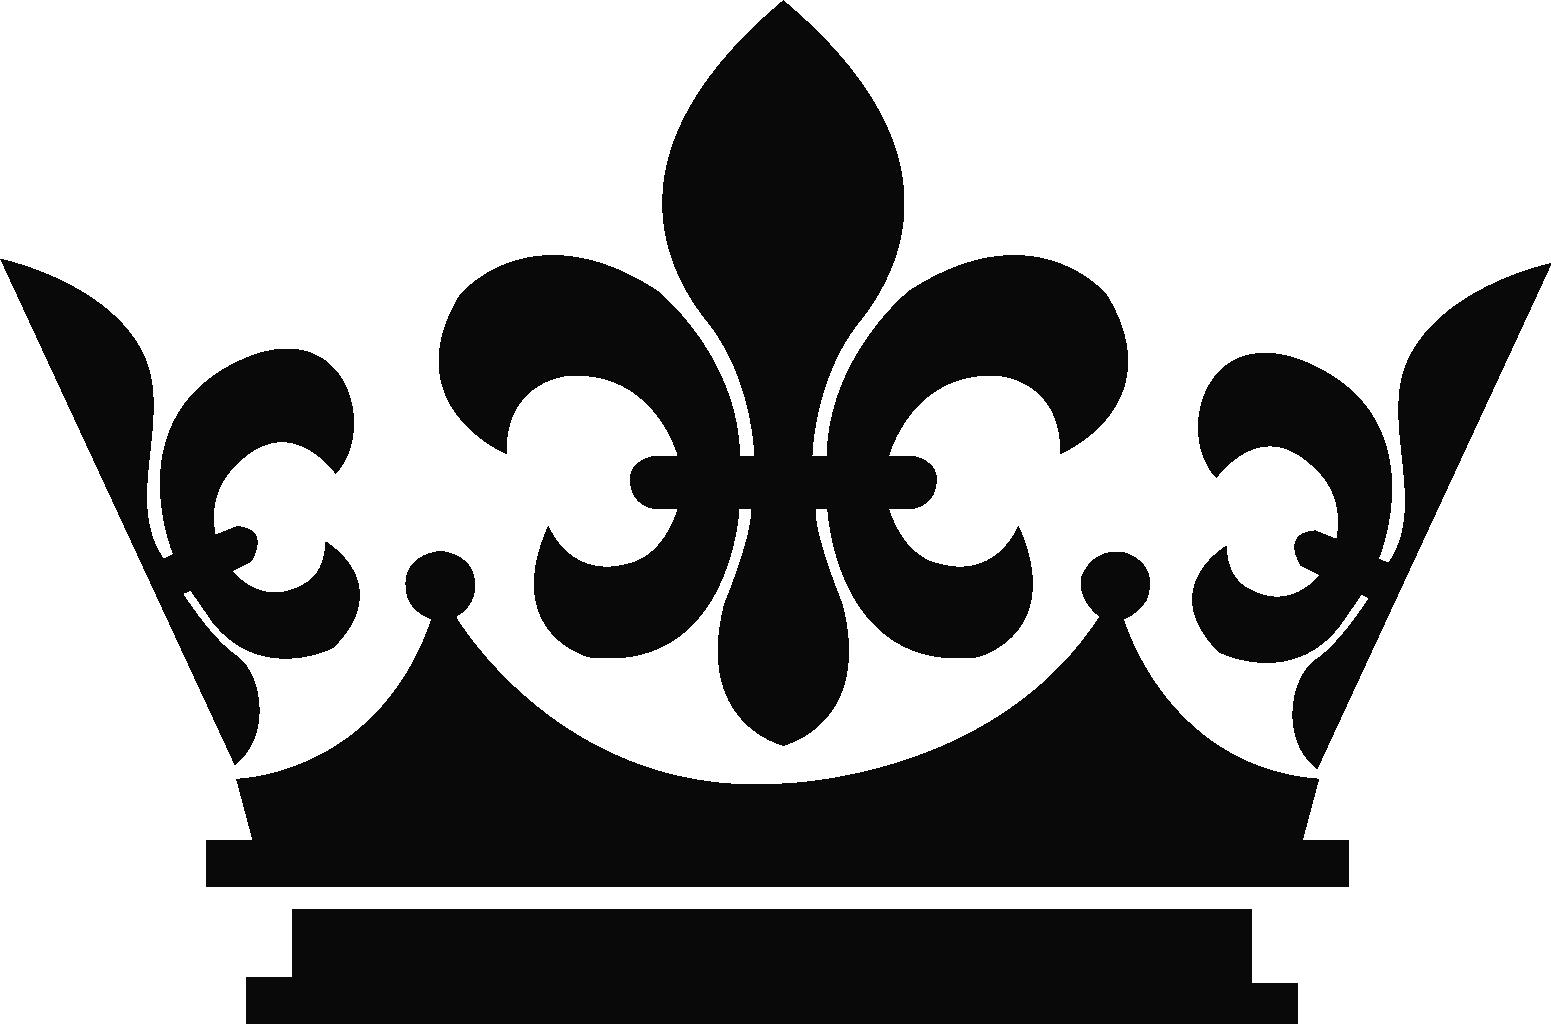 edj logo